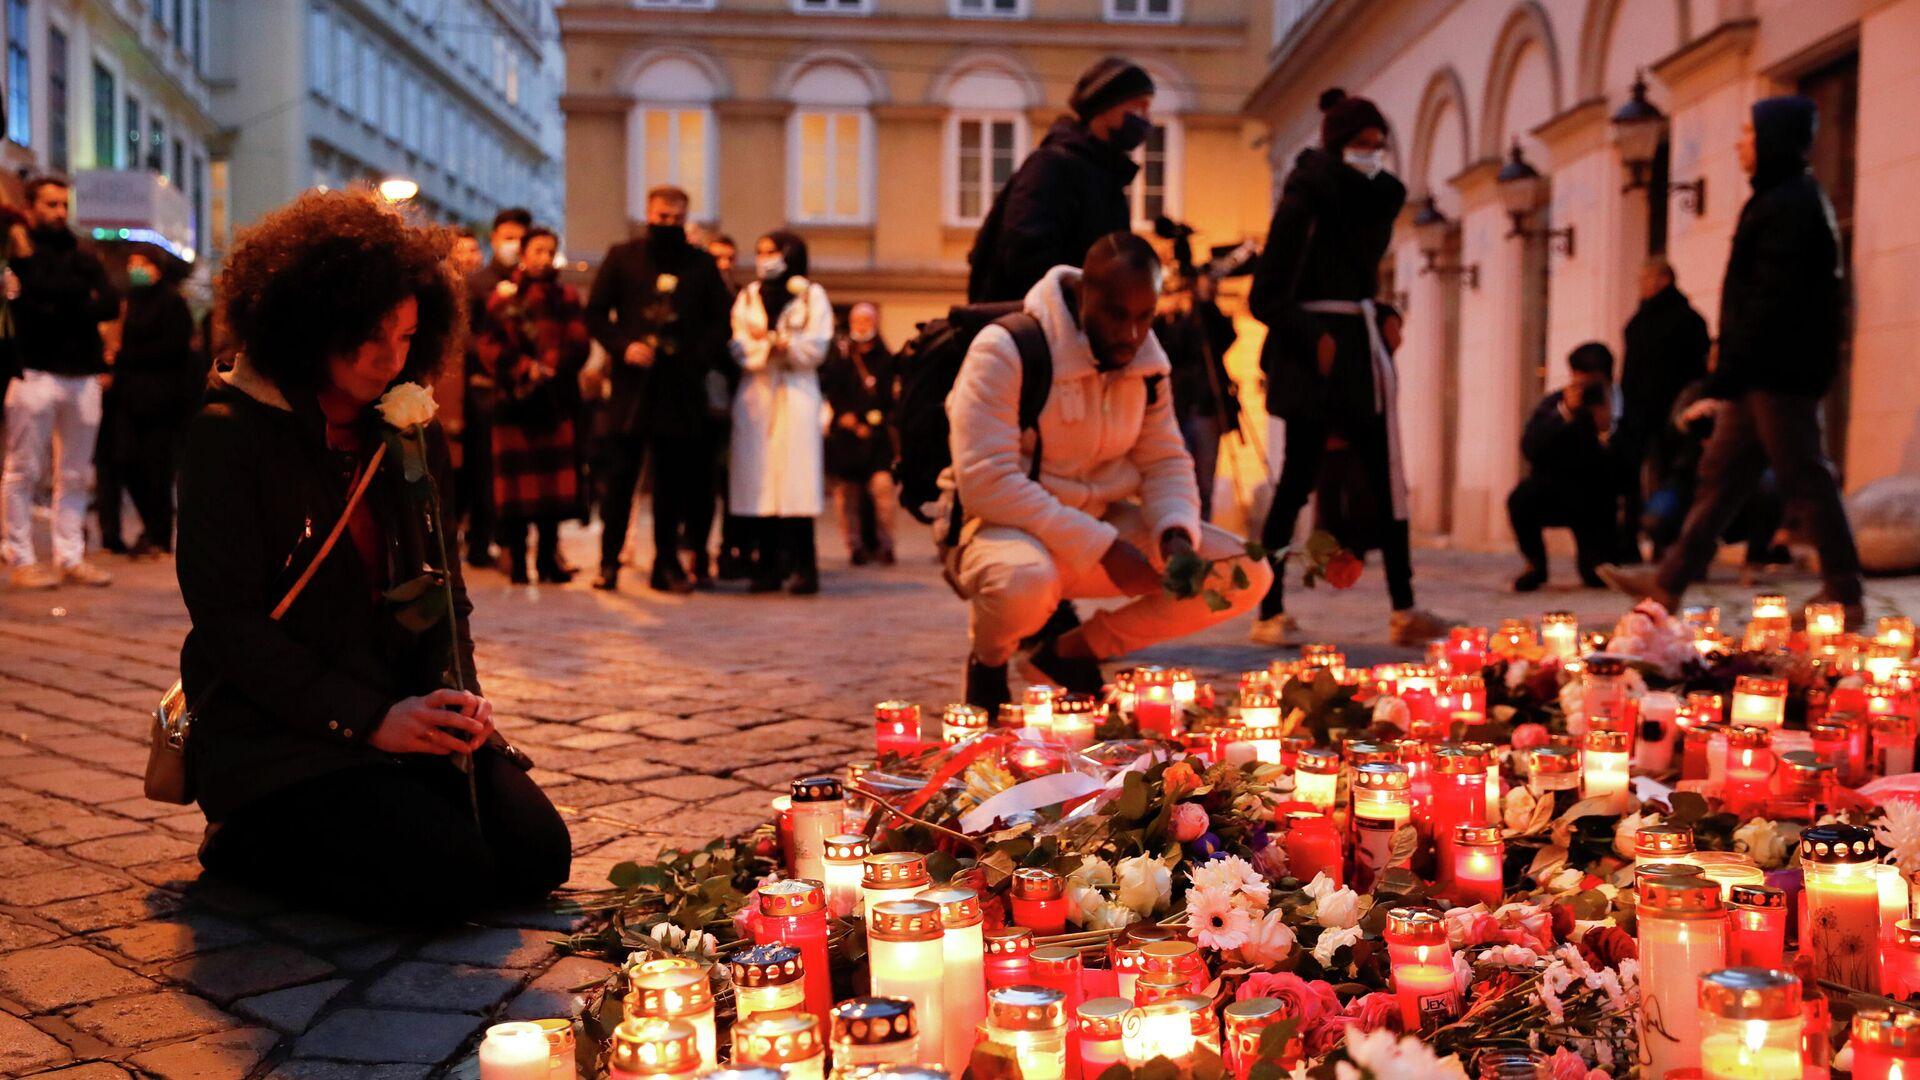 Цветы и свечи на месте теракта в Вене, Австрия - РИА Новости, 1920, 07.11.2020